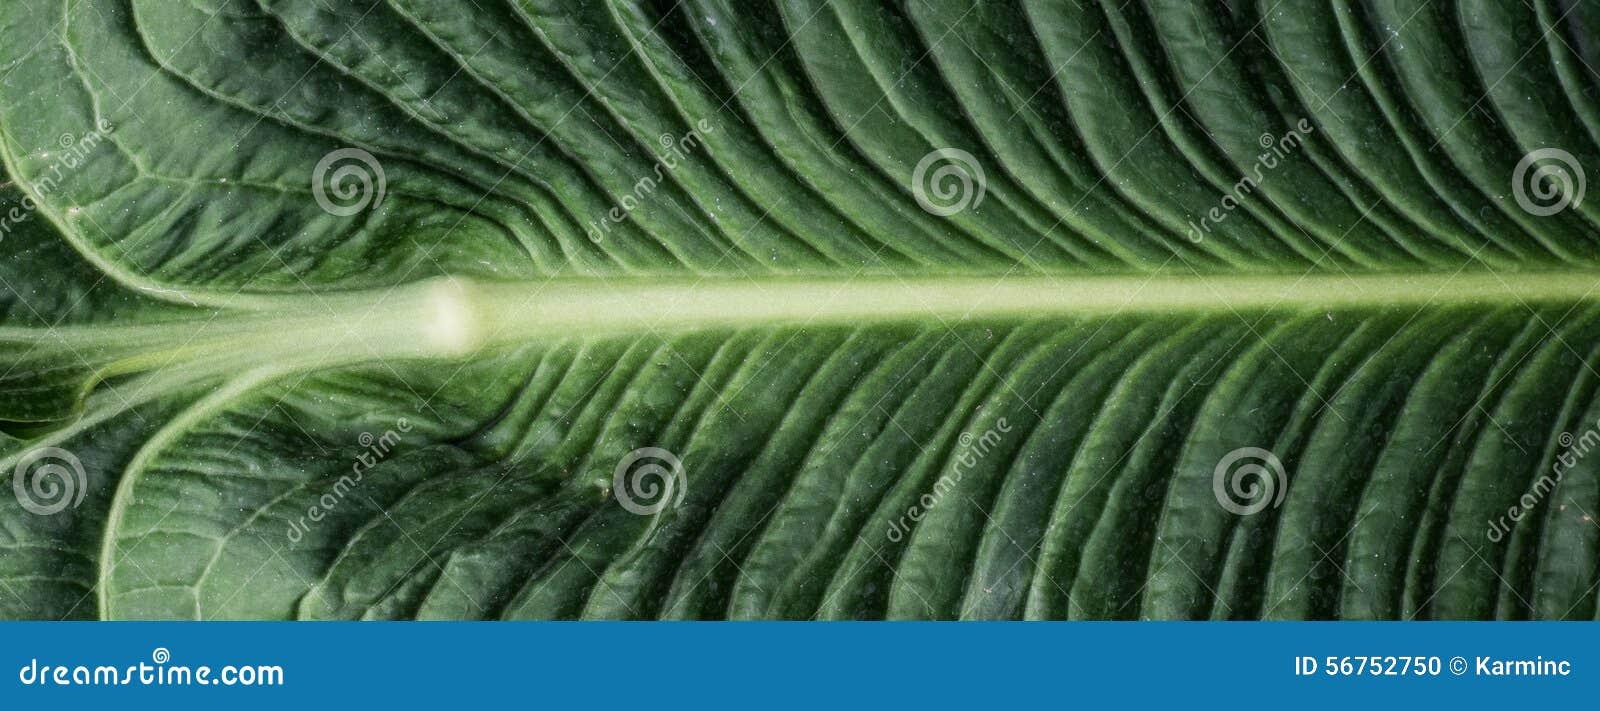 Large Green Plant Leaf Stock Photo Image 56752750